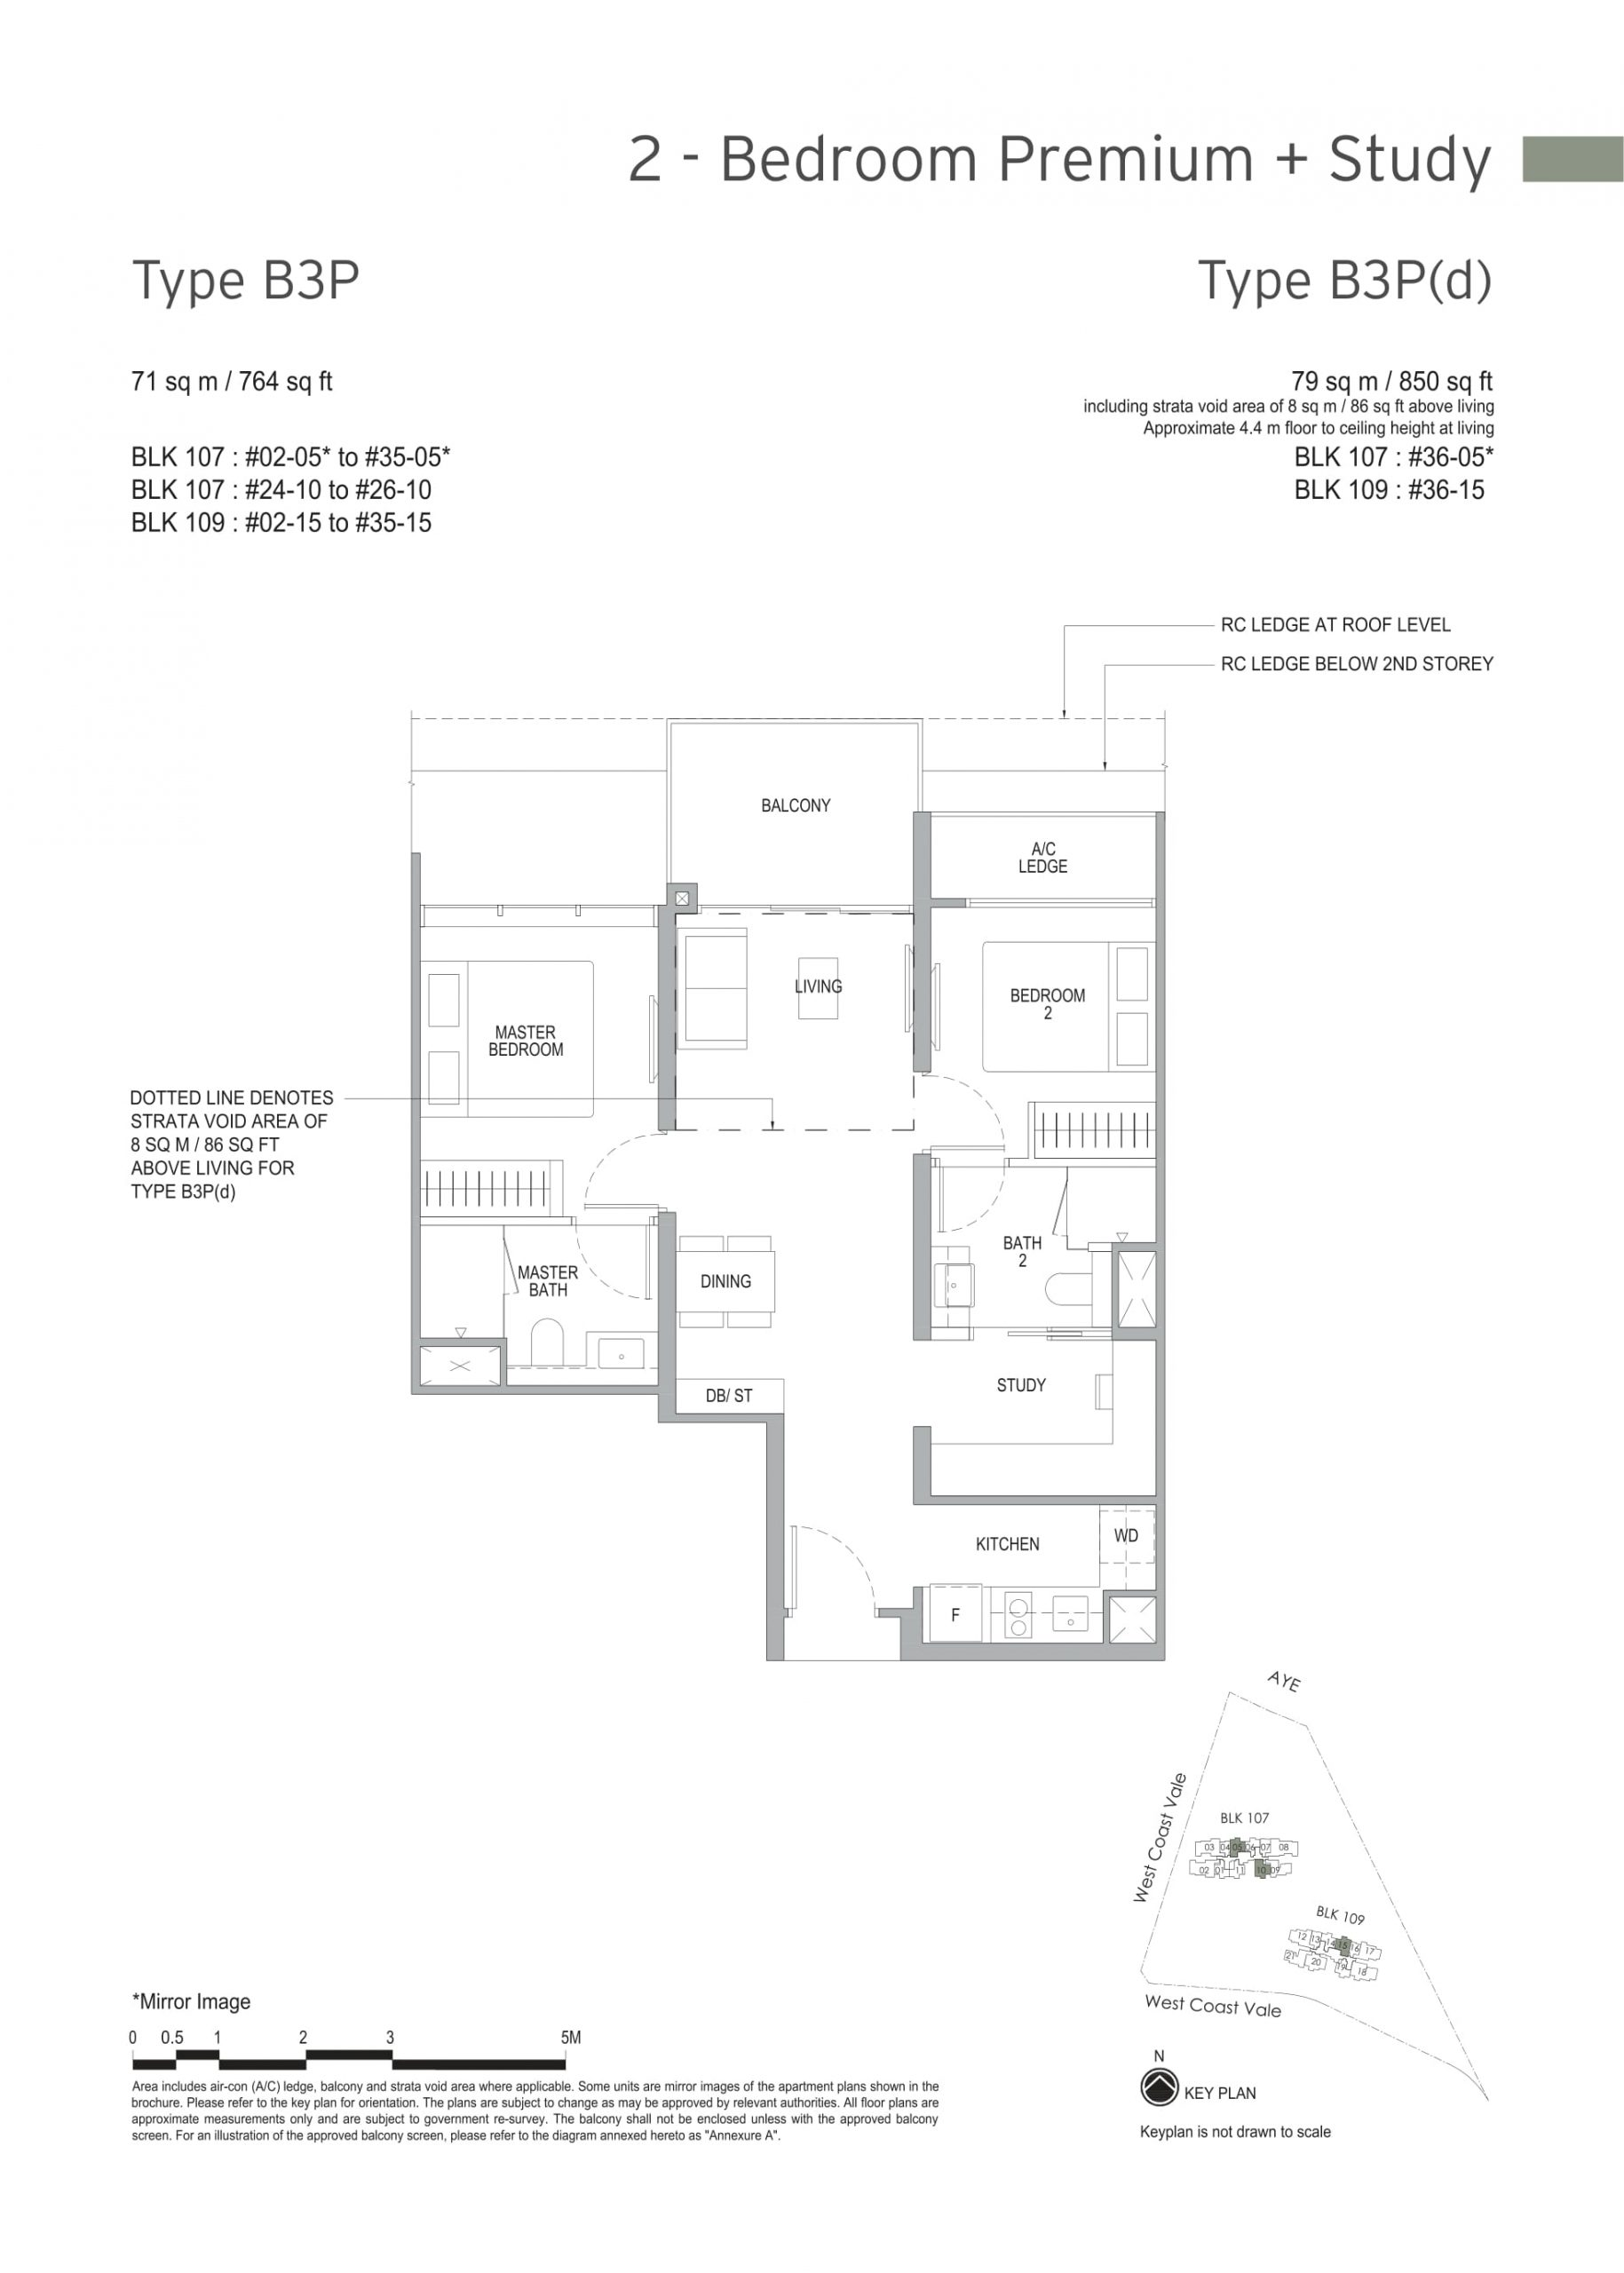 Whistler Grand's two-bedroom premium + study types